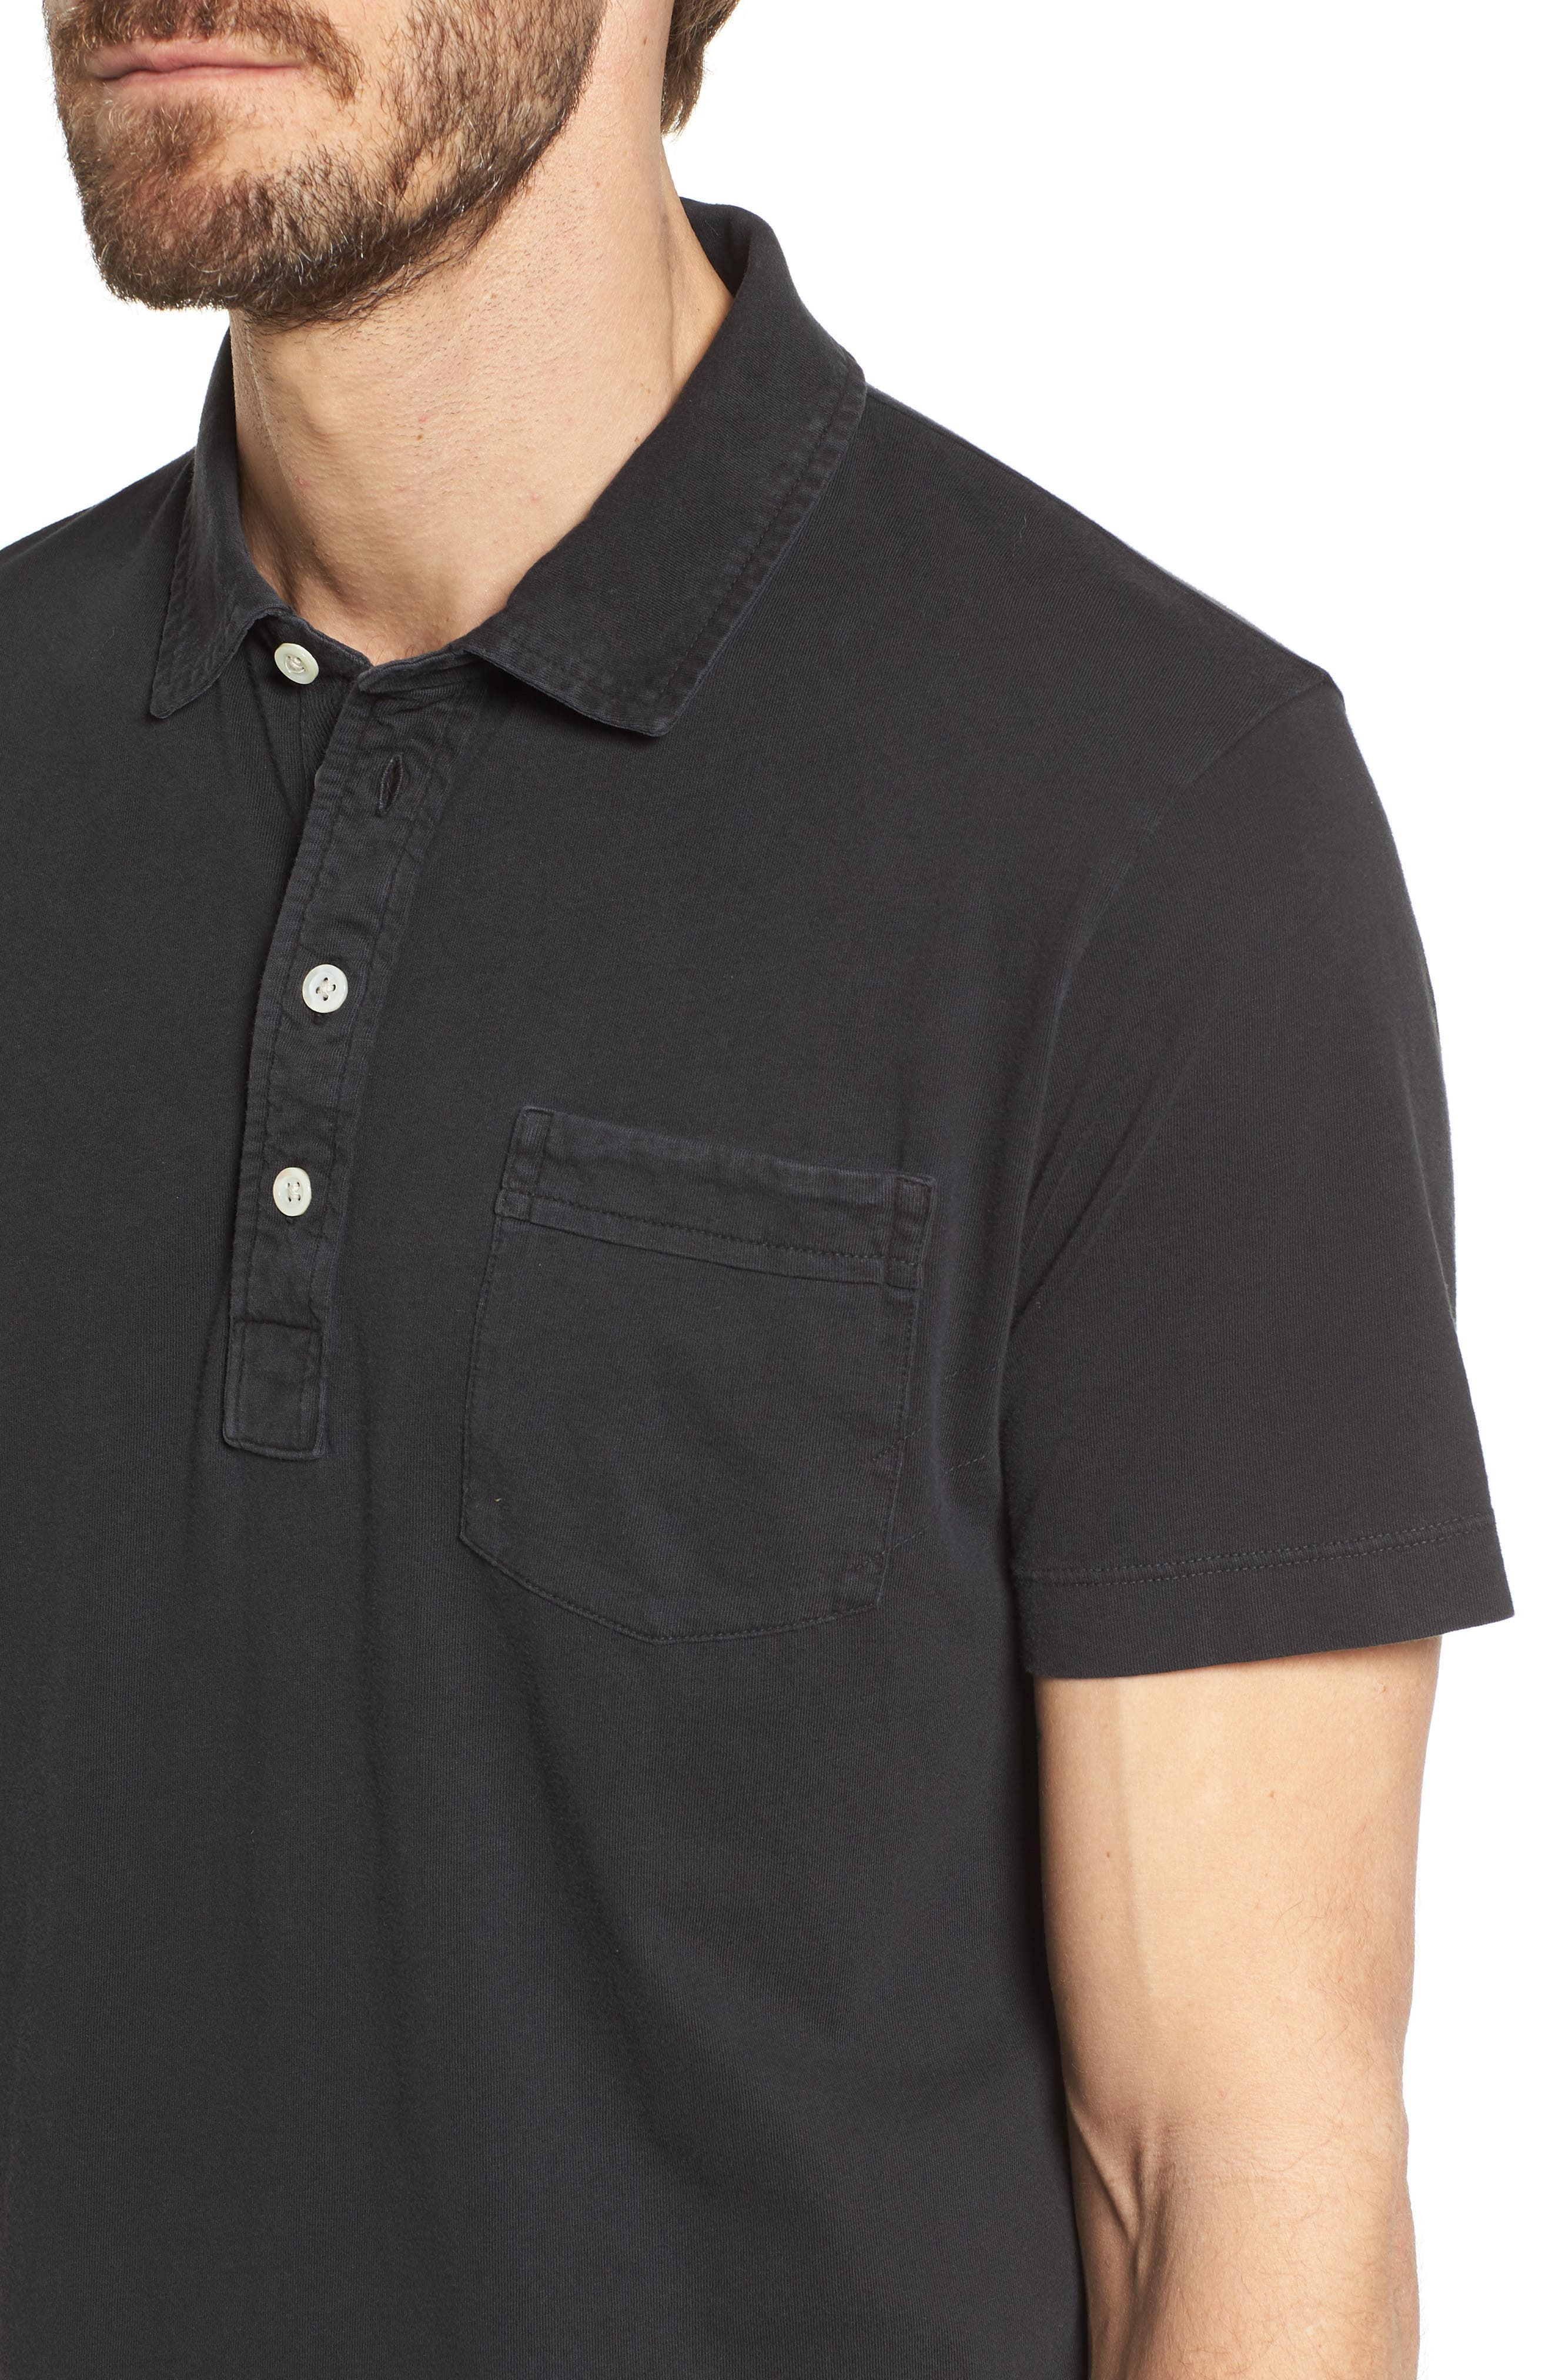 Pensacola GD Slim Fit Polo,                             Alternate thumbnail 4, color,                             Black